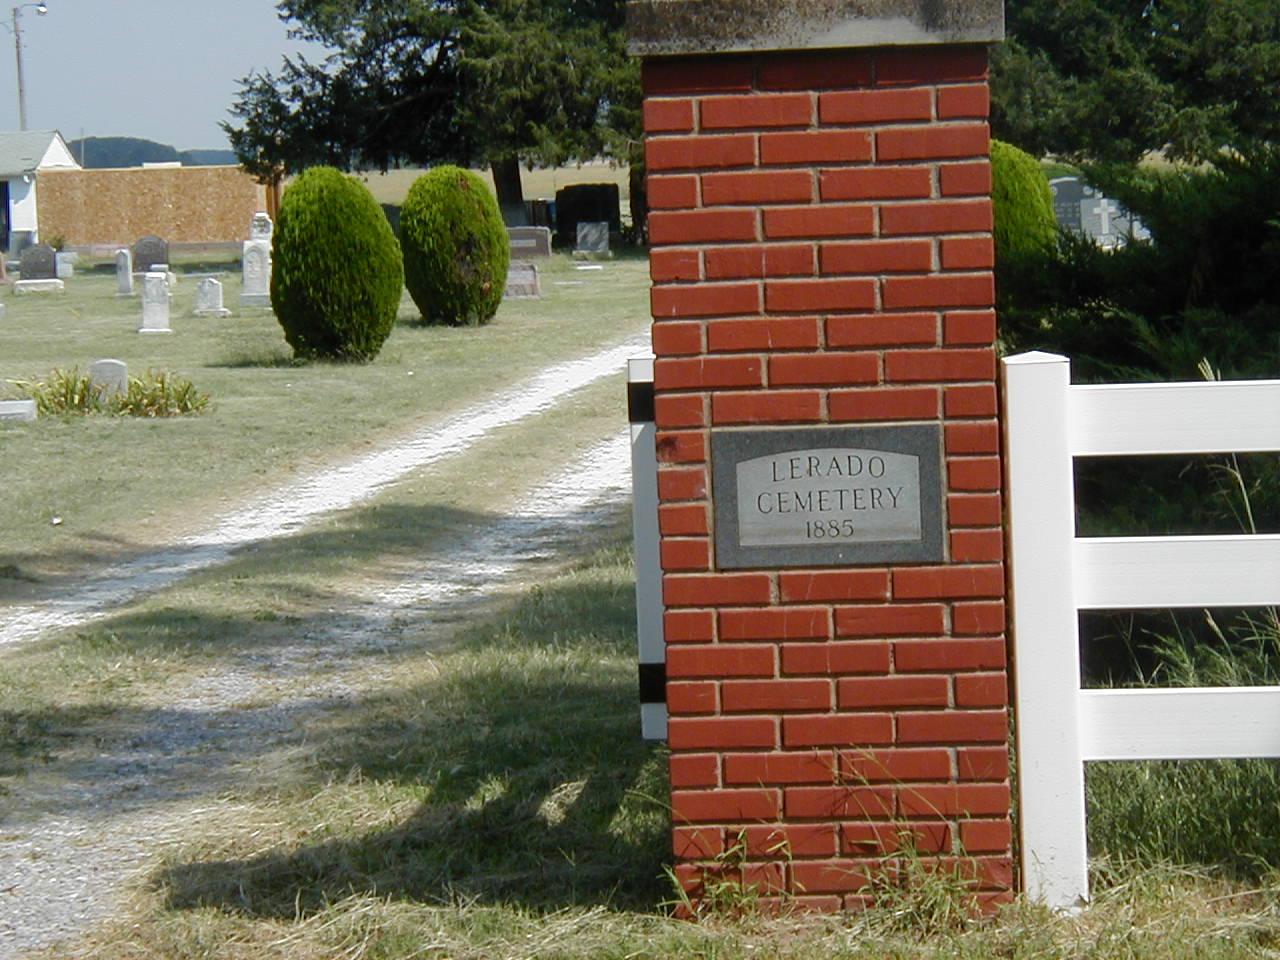 Lerado Cemetery